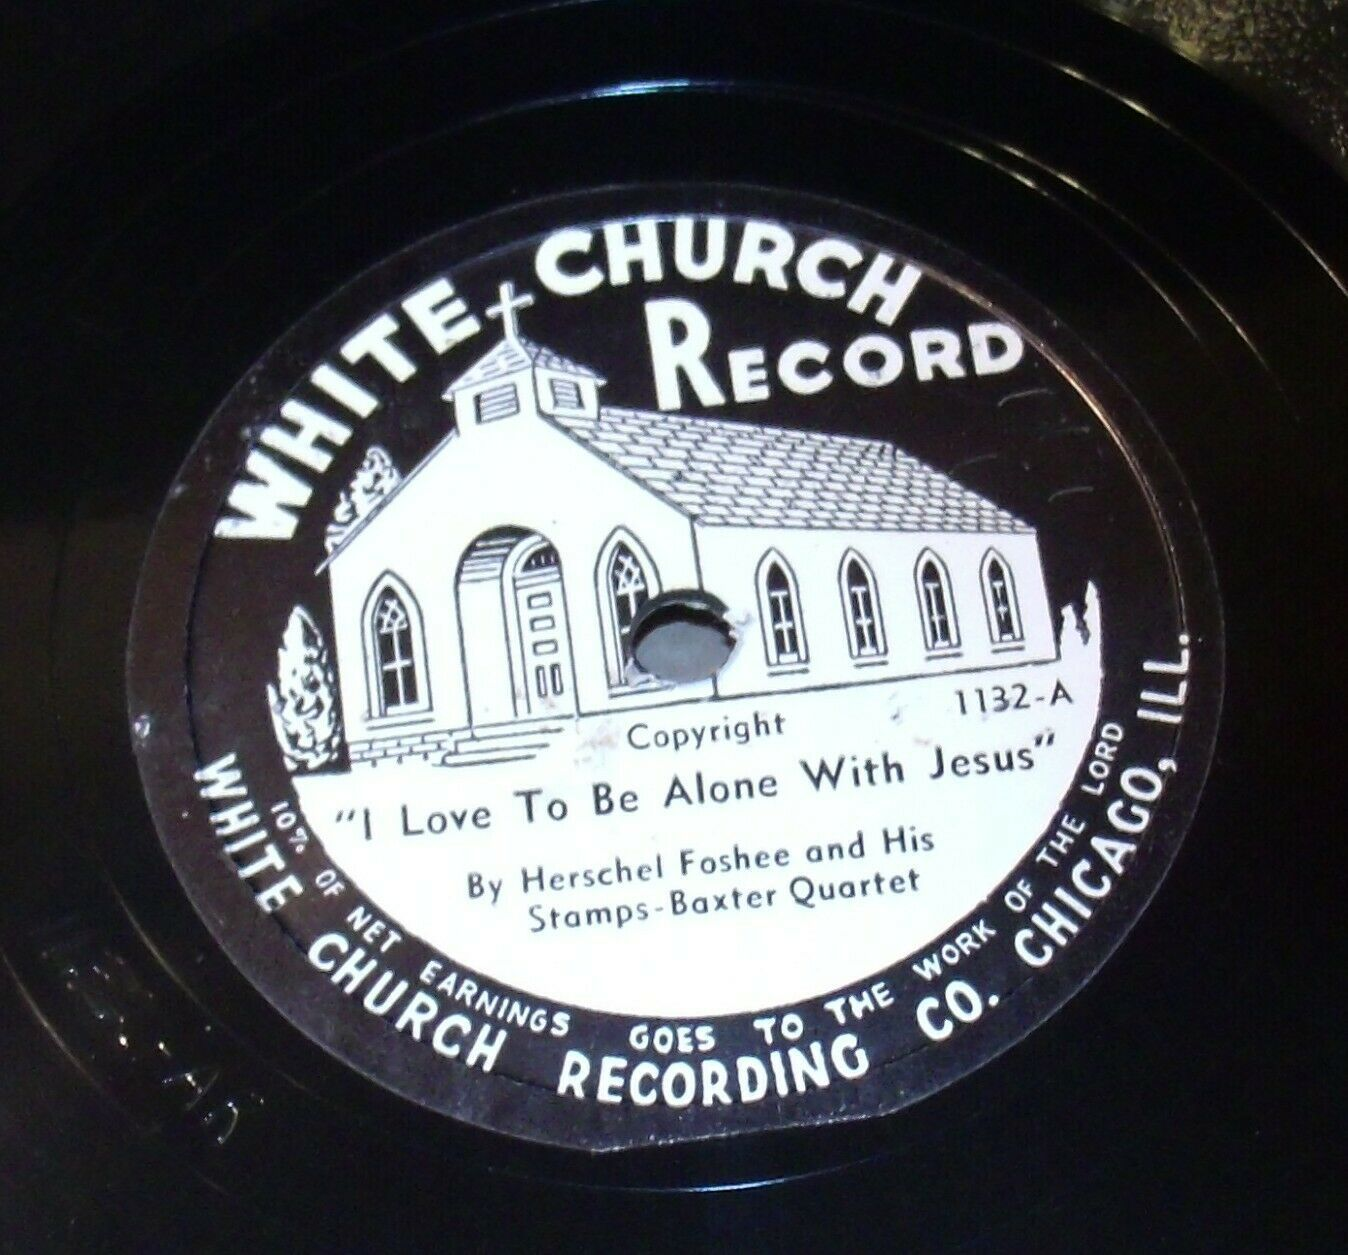 White Church Record # 1132 AA-191720O Vintage Collectible